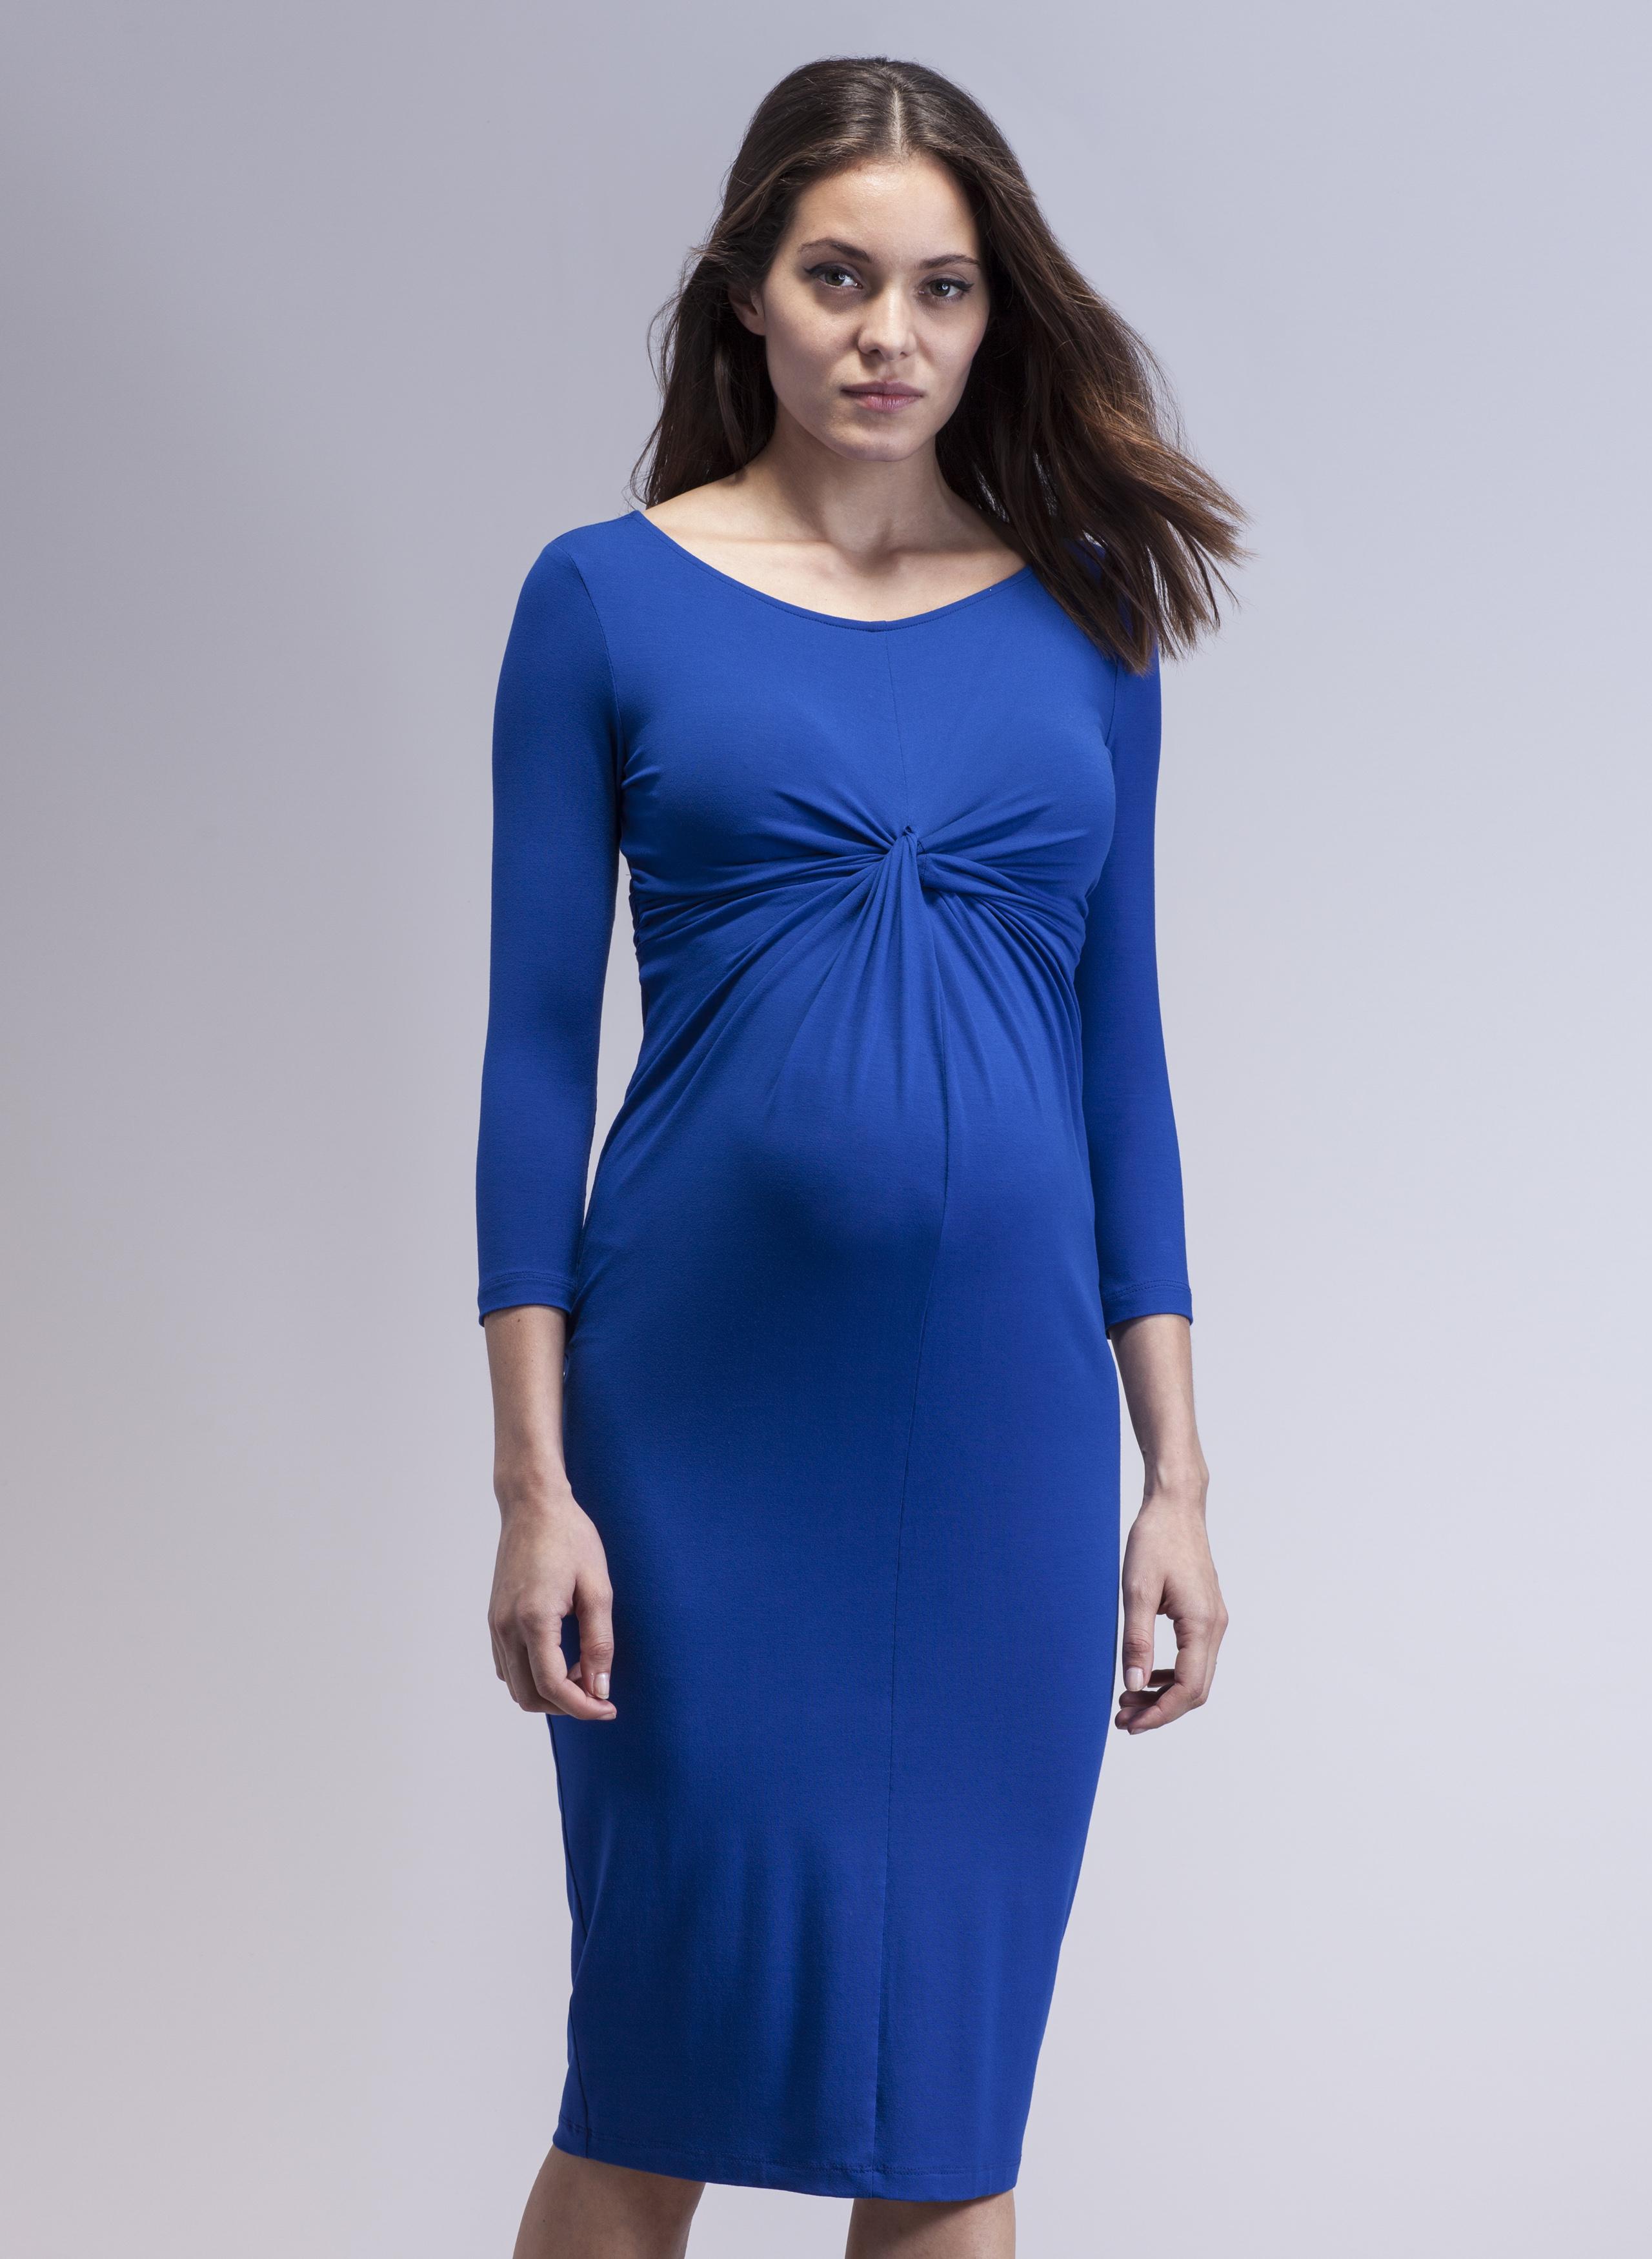 Cobalt Blue Maternity Dress from Isabella Oliver